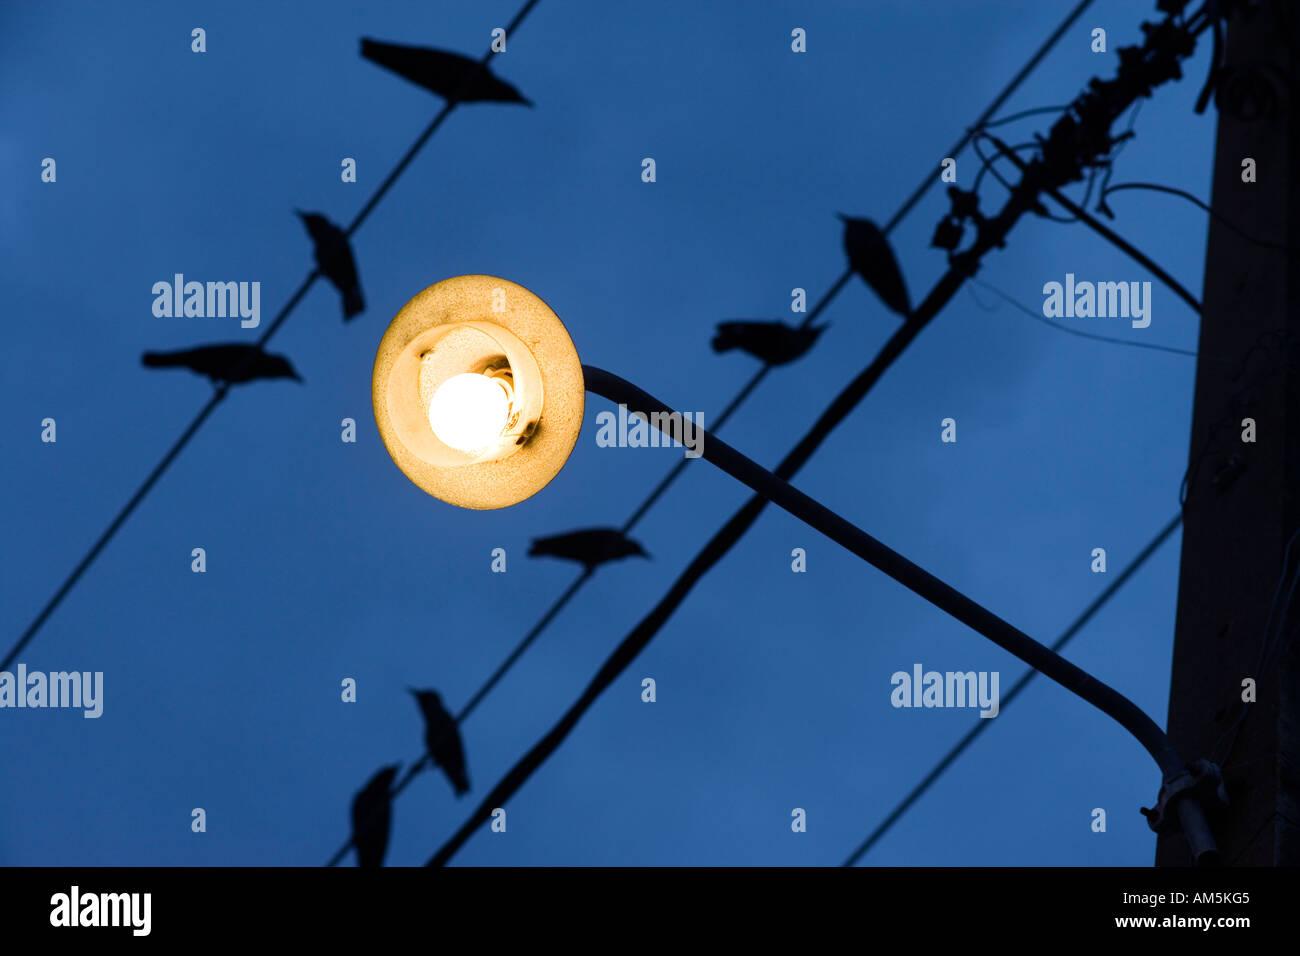 https://c7.alamy.com/comp/AM5KG5/birds-on-a-wire-yellow-street-lamp-against-a-dark-blue-sky-AM5KG5.jpg